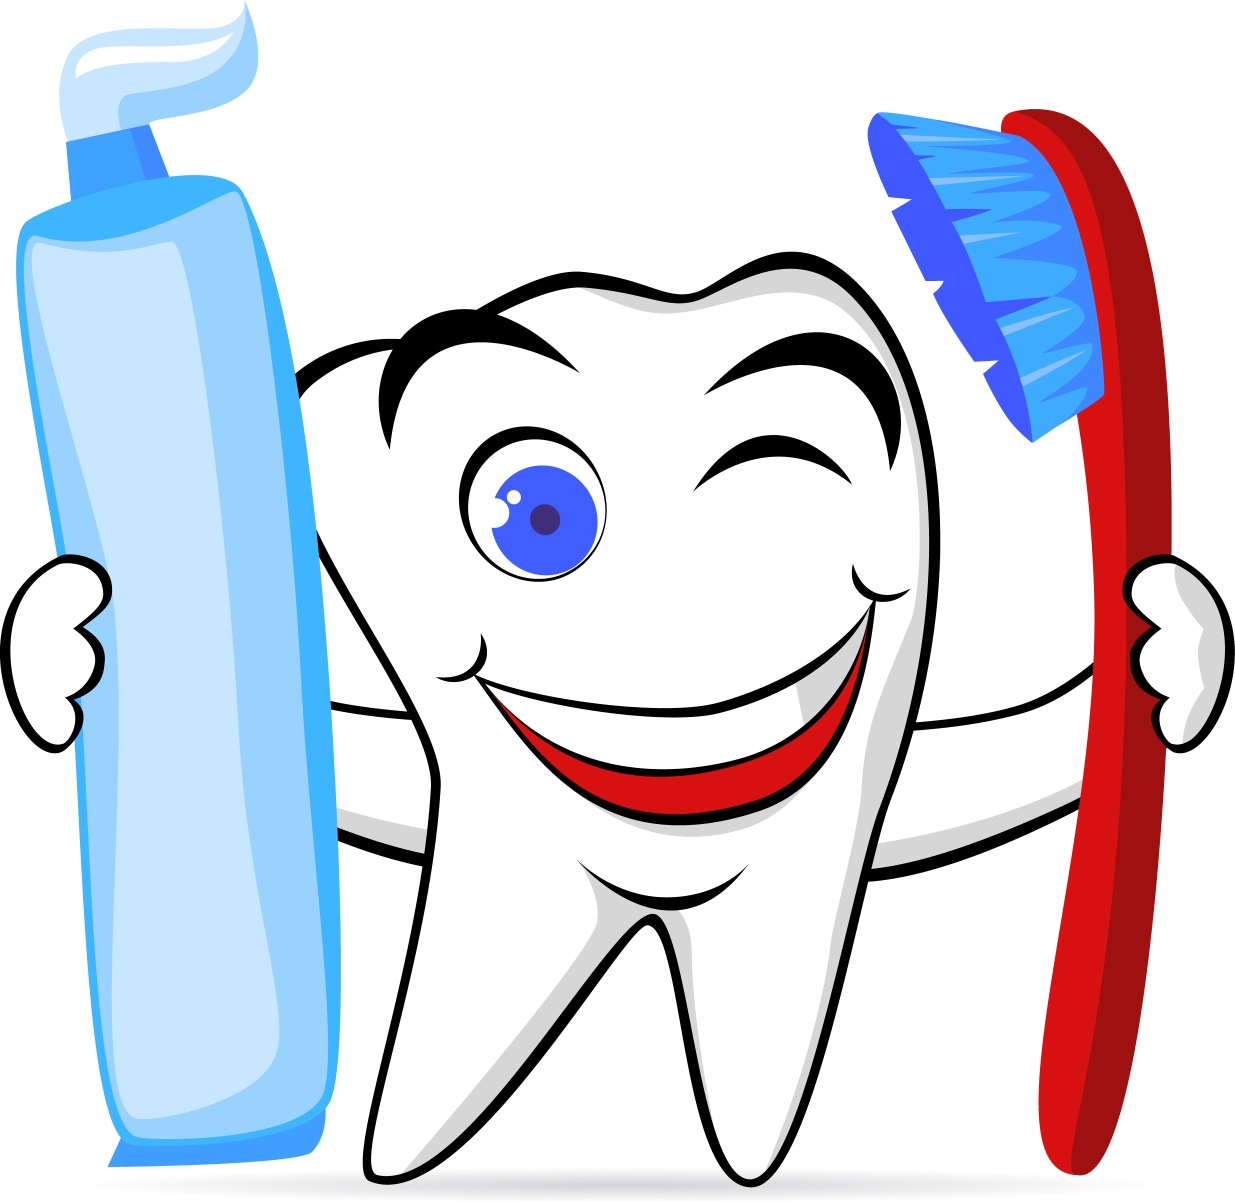 Dentist clipart toothbrush. Cilpart amusing for preschool